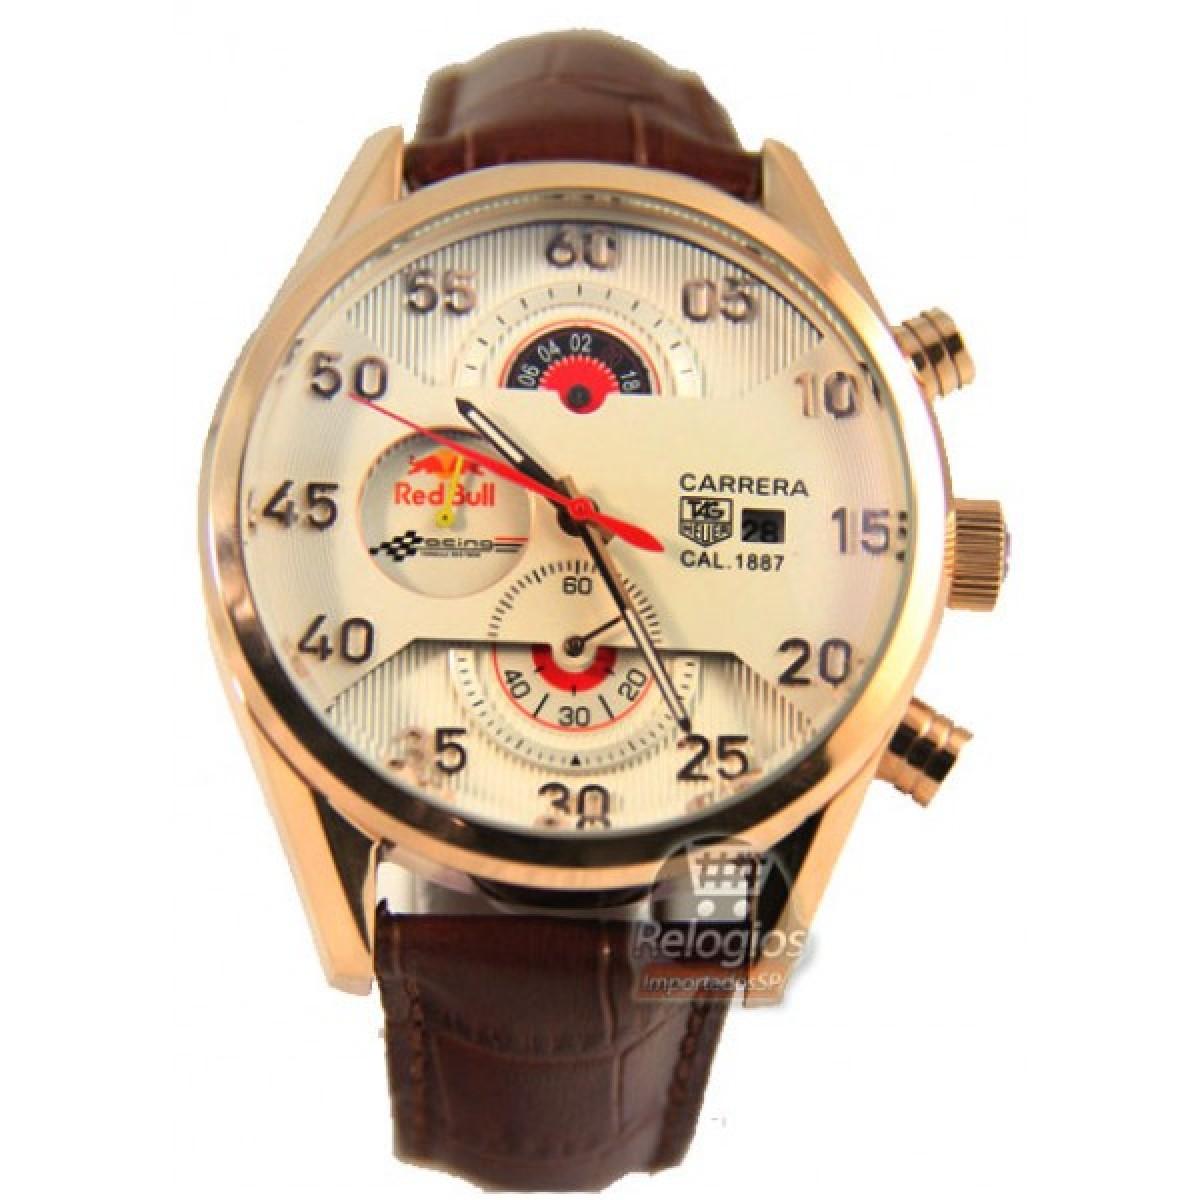 4dff10afe32 Relógio Réplica Tag Heuer Carrera Racing Red Bull